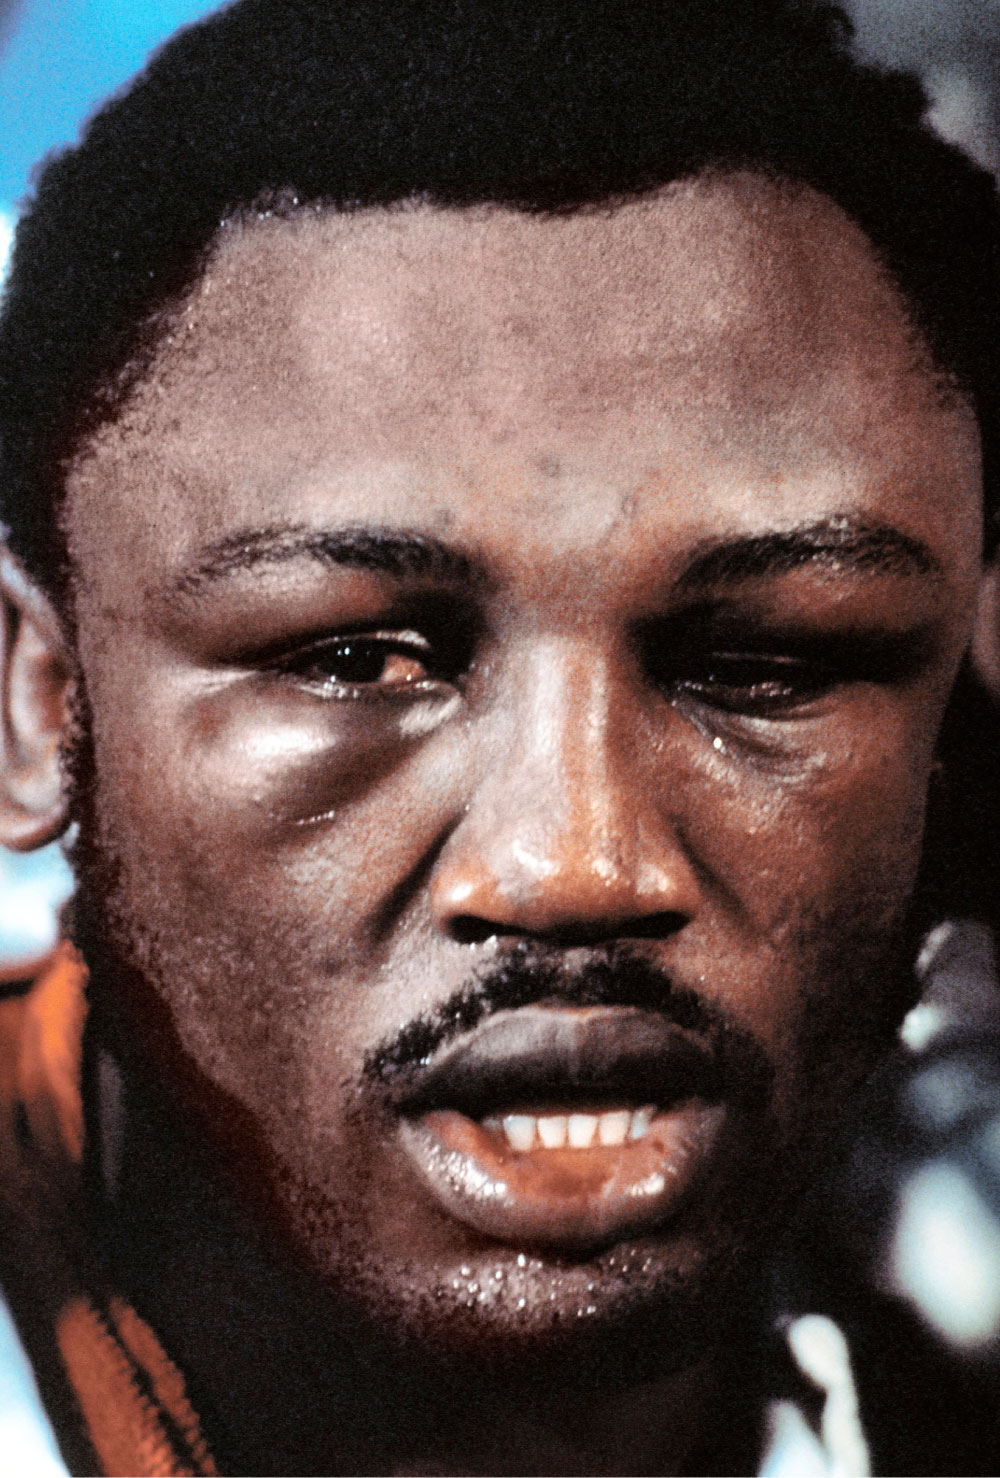 Neil Leifer: The Boxing Photos | Longform - SI.com Neil Leifer